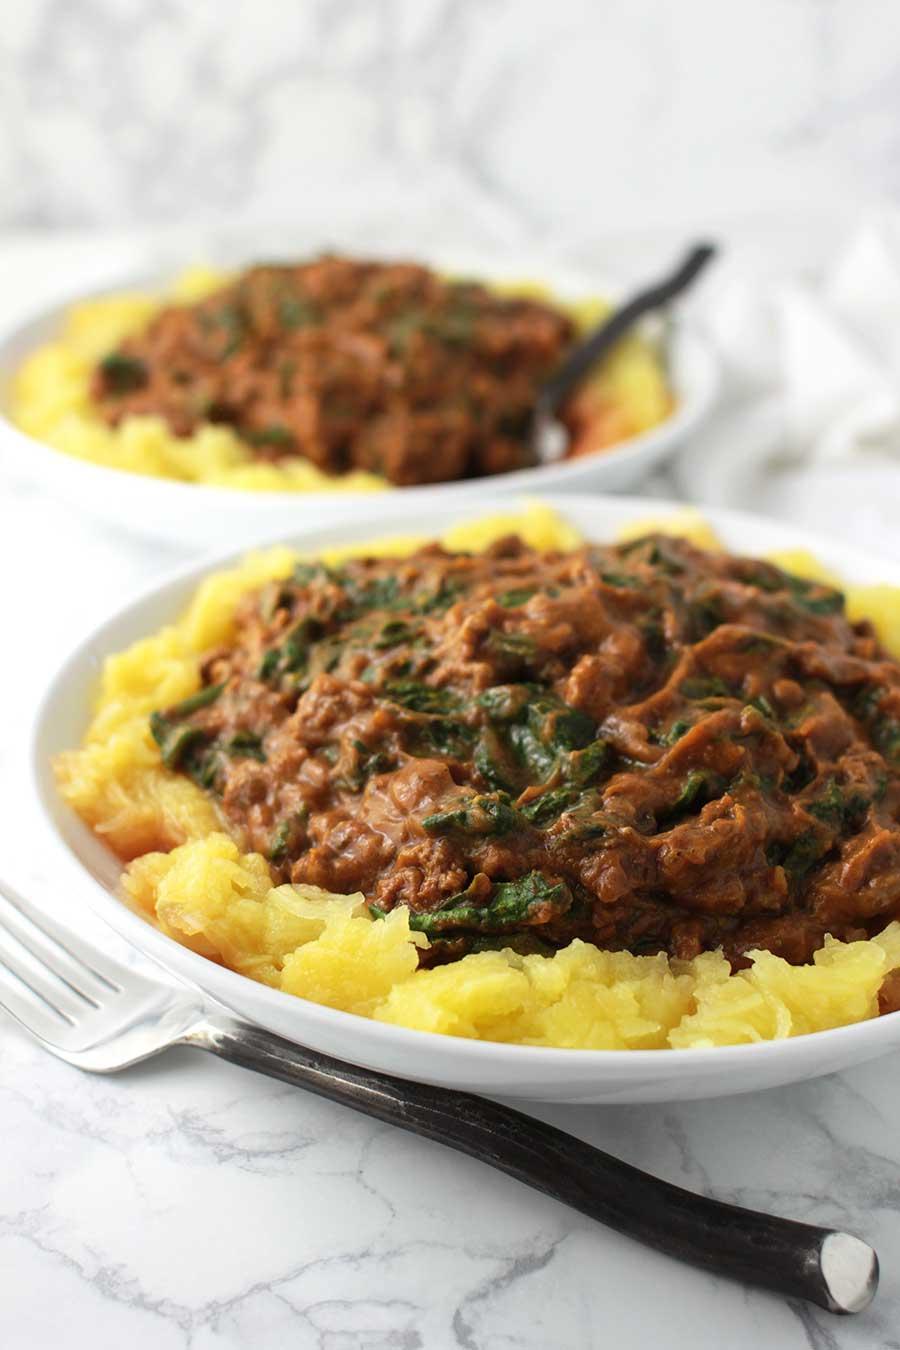 AIP Spaghetti with Nomato Sauce recipe from acleanplate.com #aip #paleo #autoimmuneprotocol